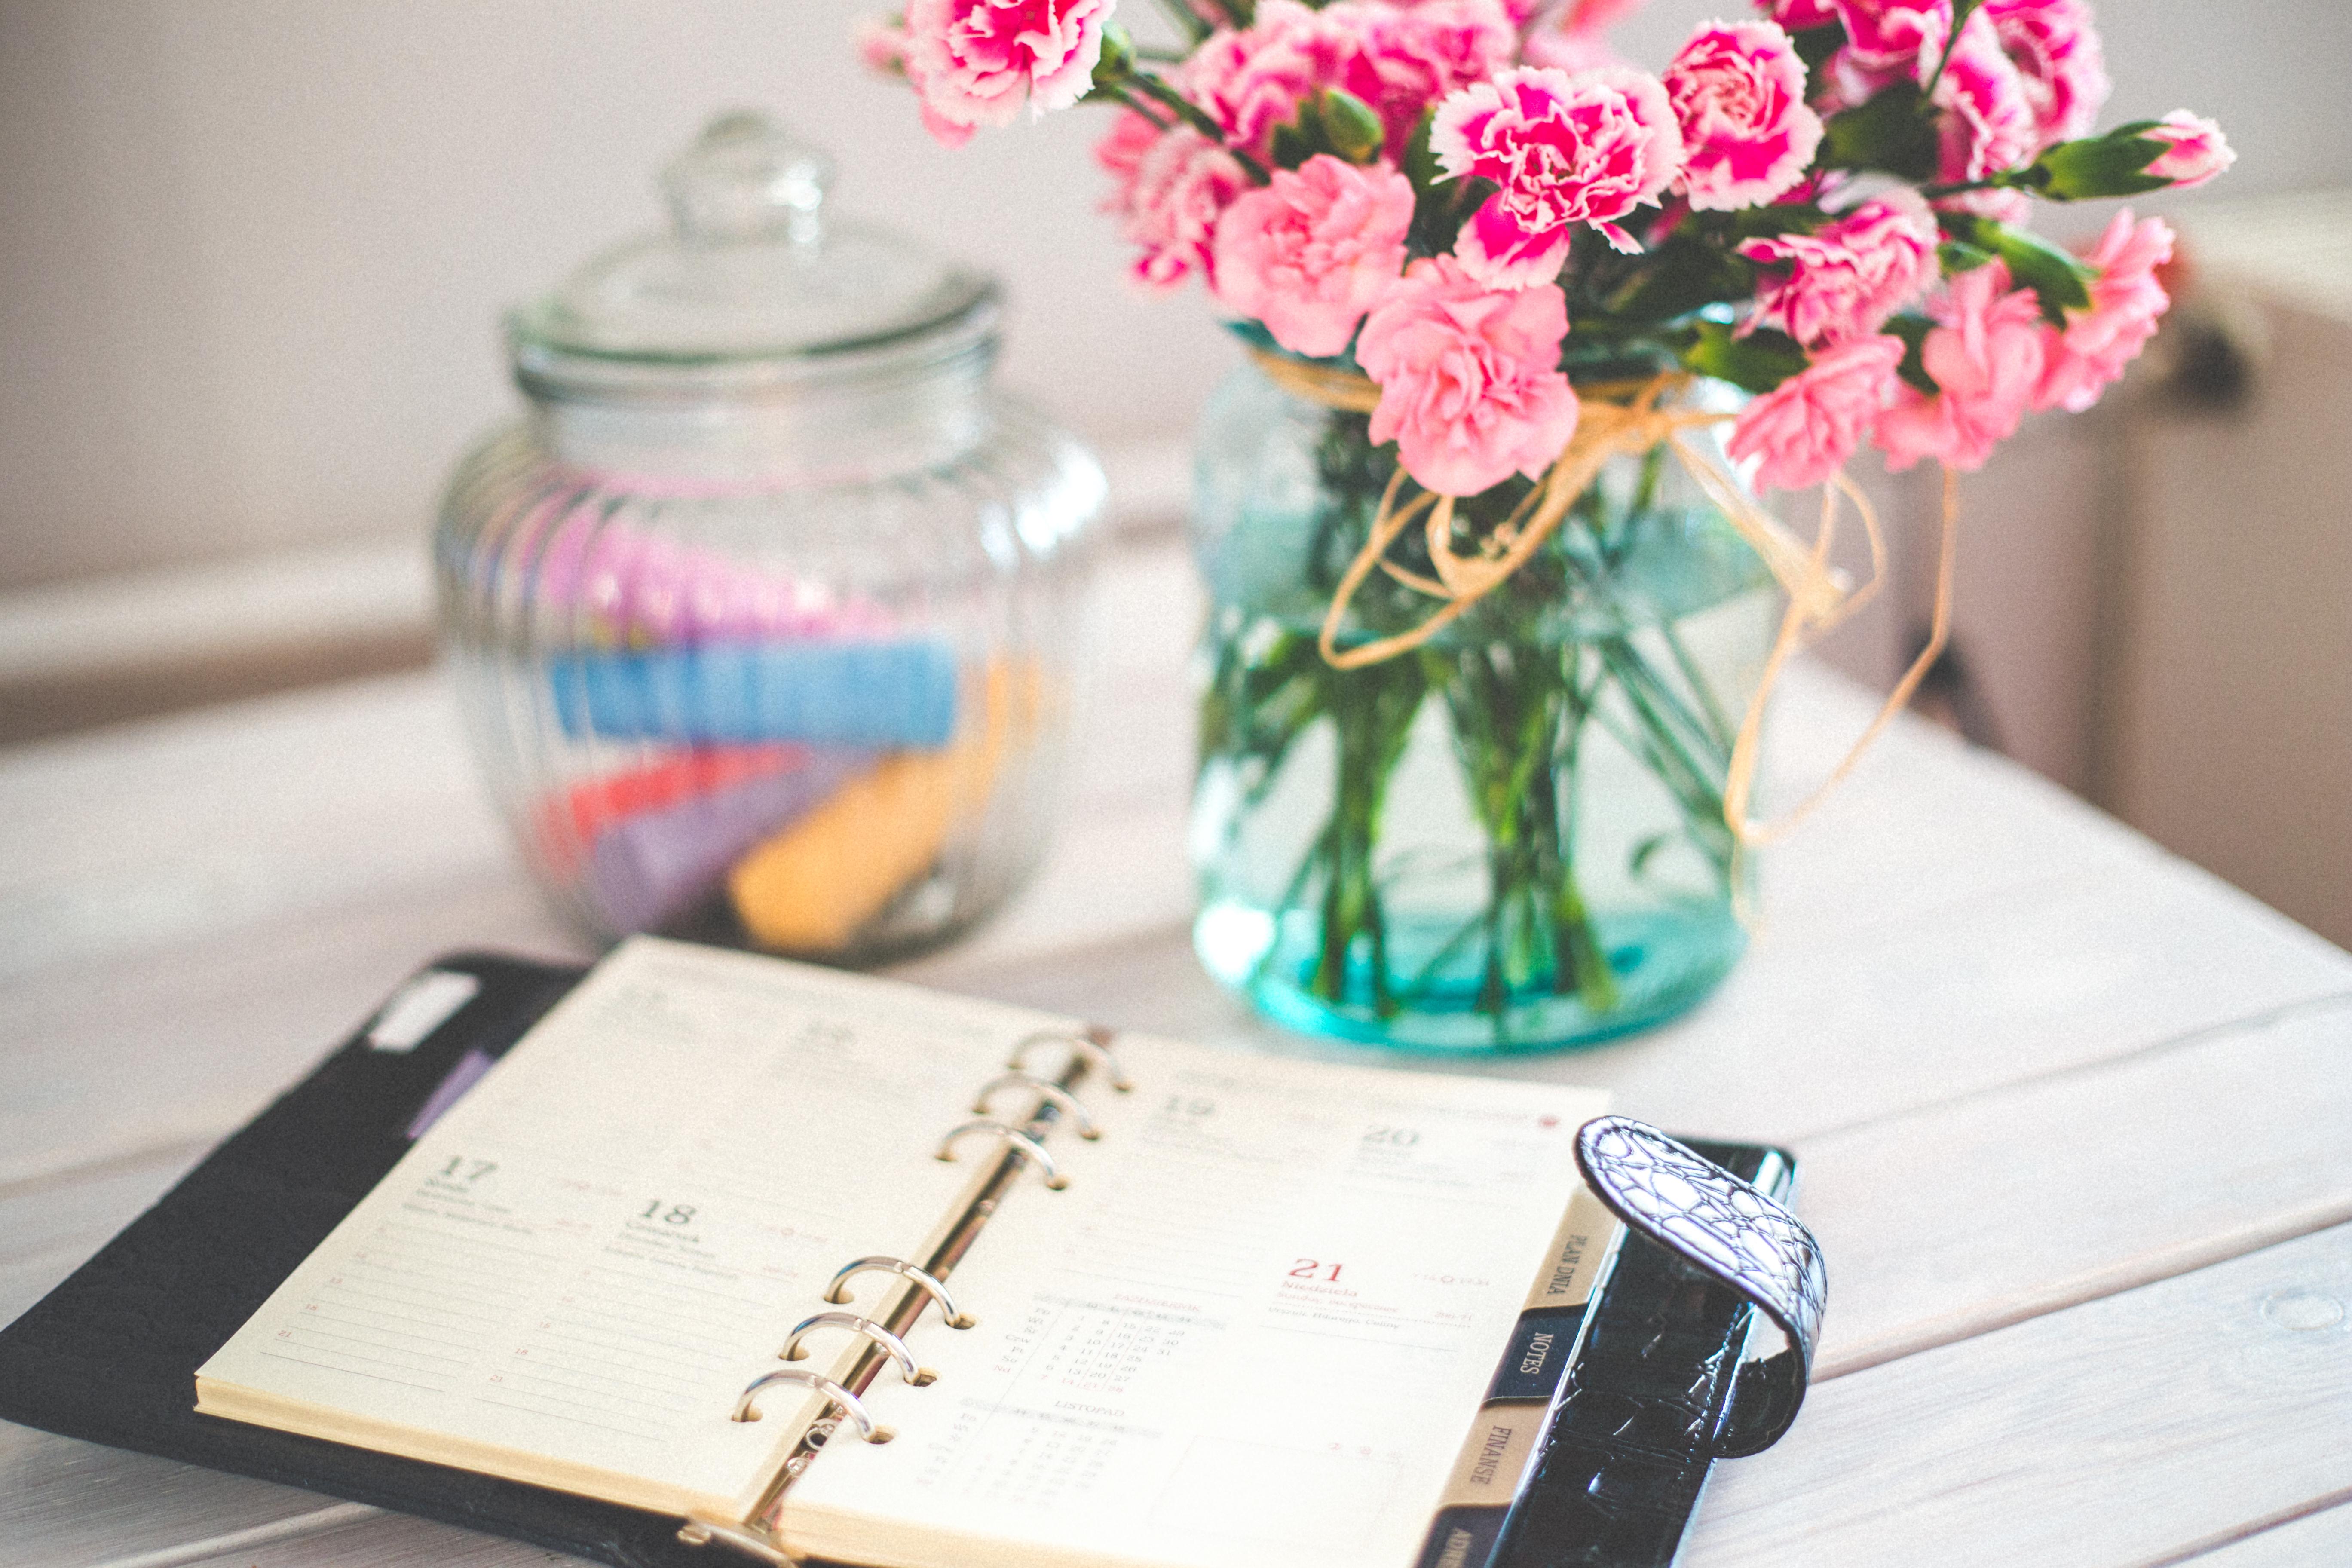 flowers-desk-office-vintage